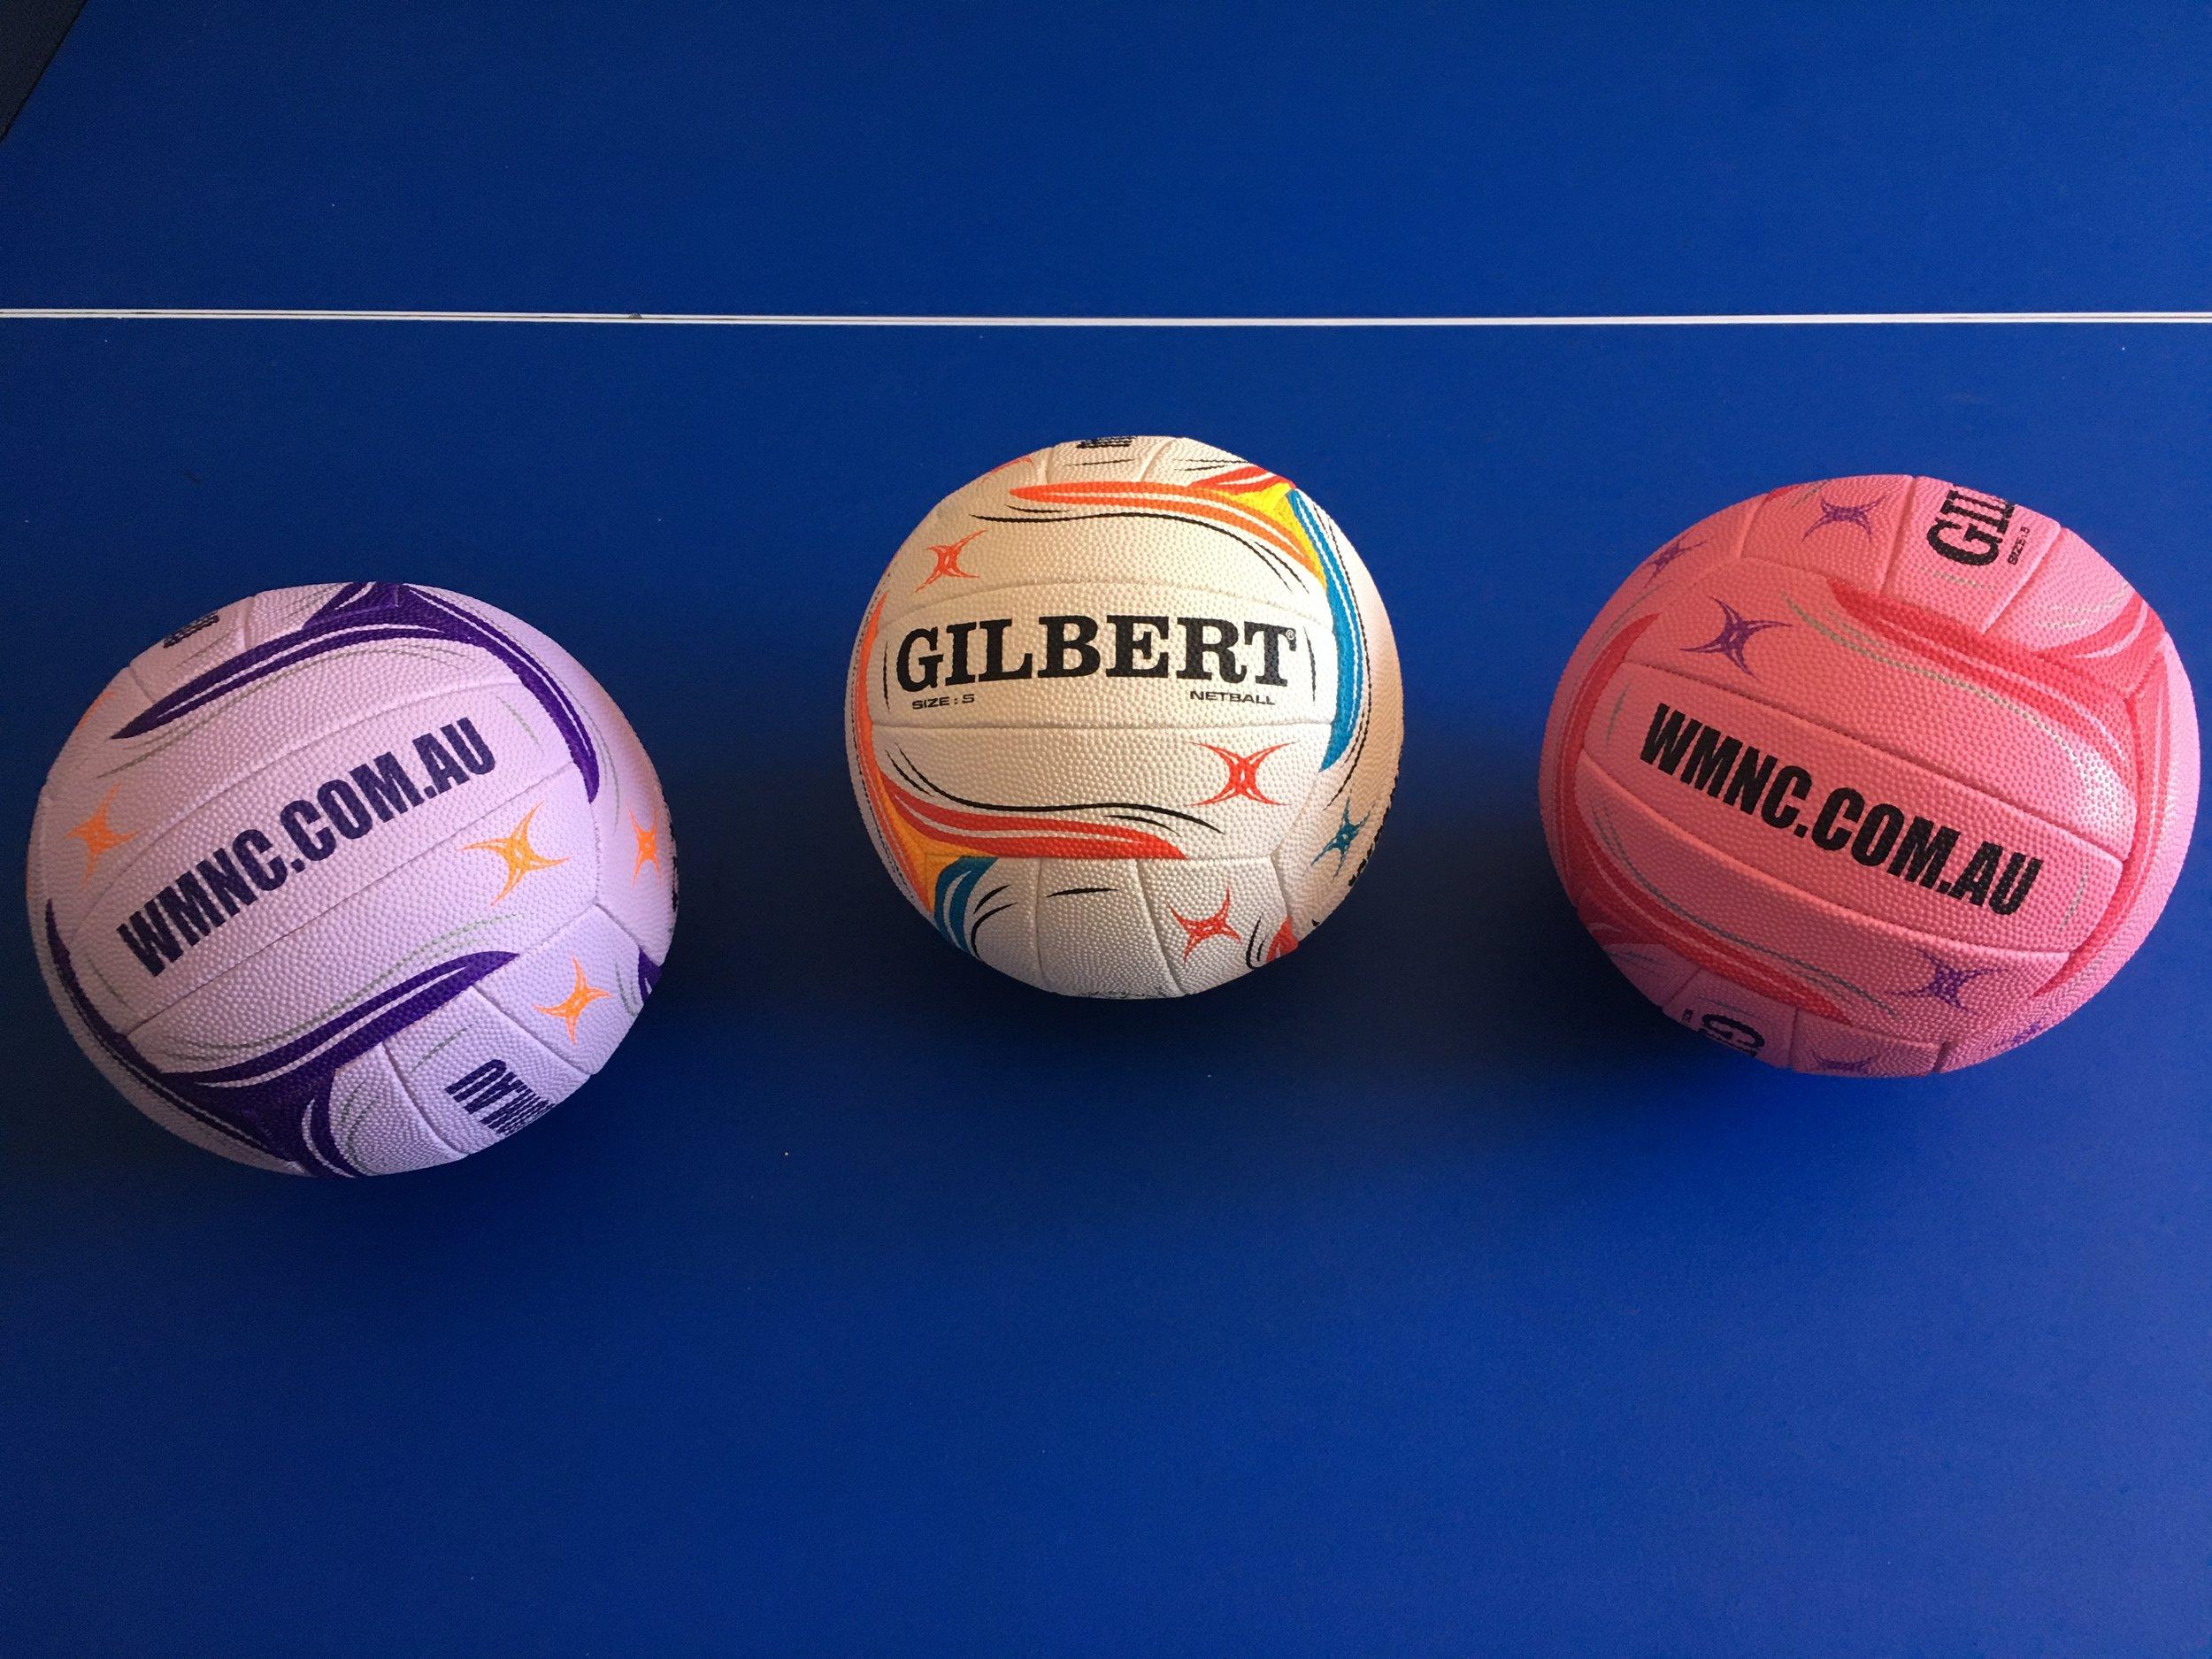 Promotional netballs